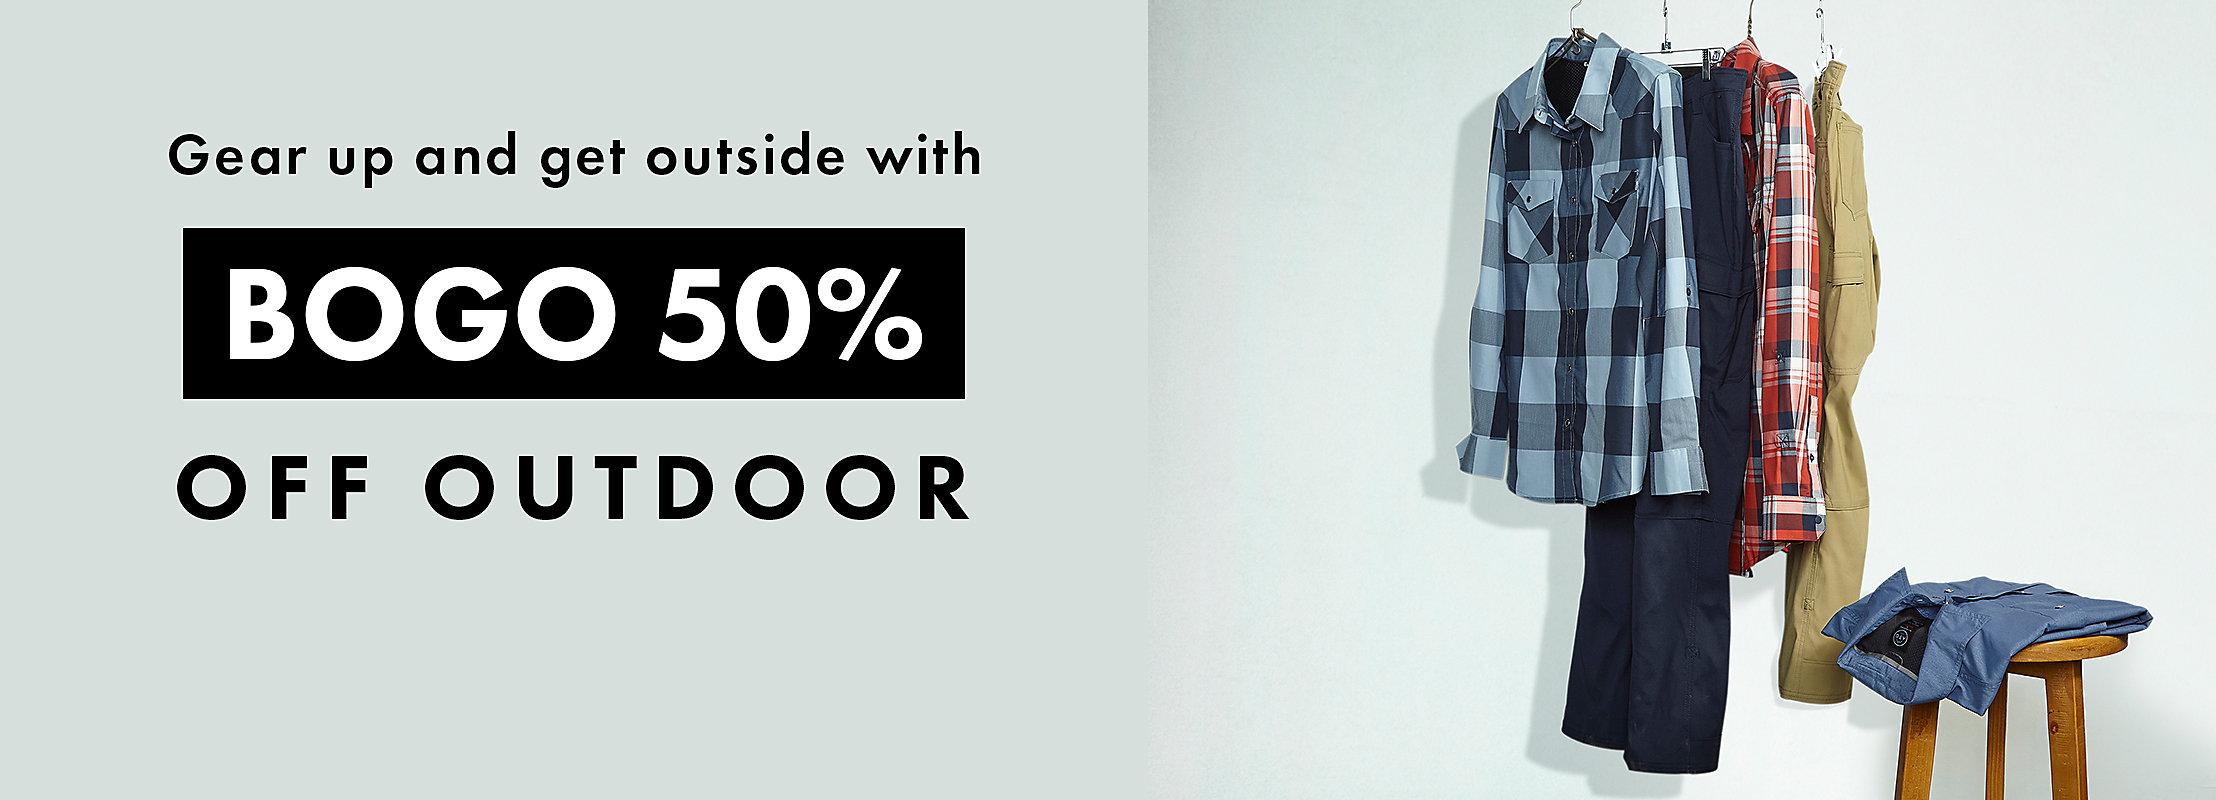 BOGO 50% OFF OUTDOOR | SHOP NOW